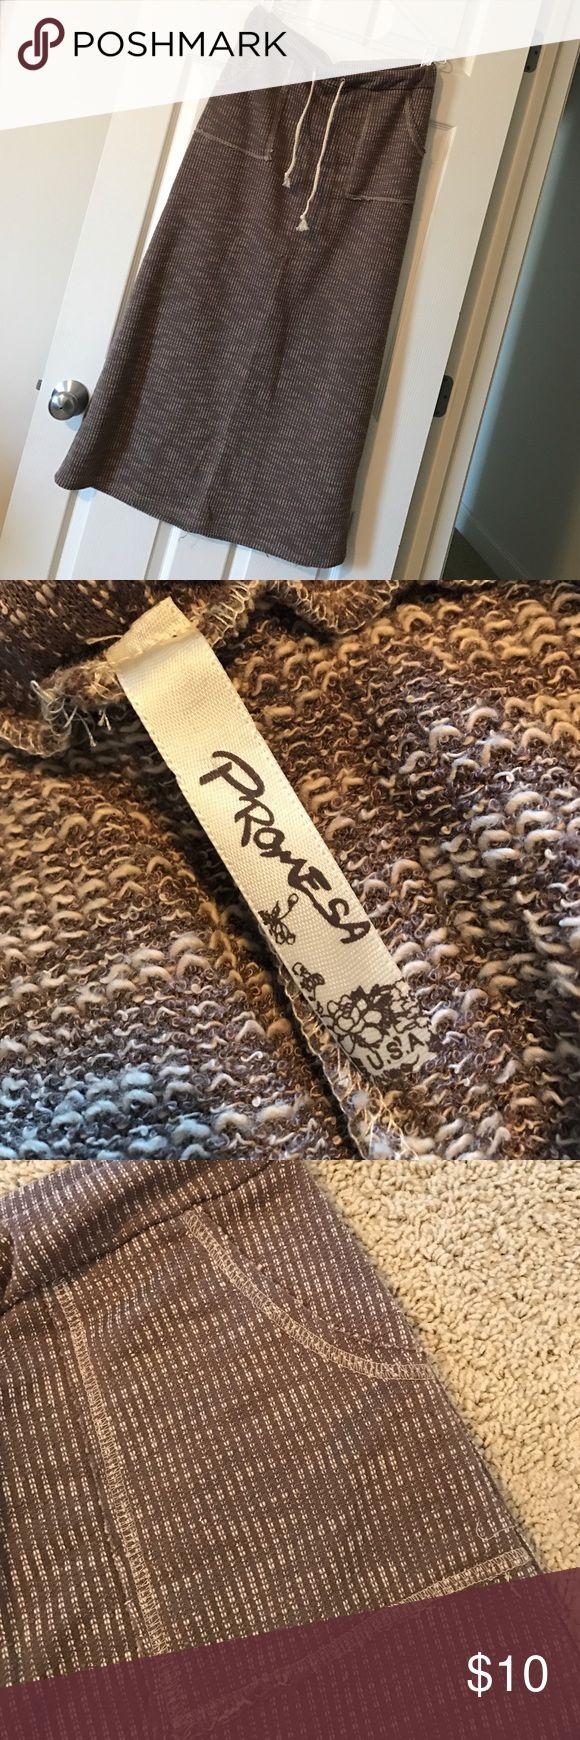 Promesa Maxi Skirt Women's Promesa brown/beige maxi skirt size L Promesa Skirts Maxi